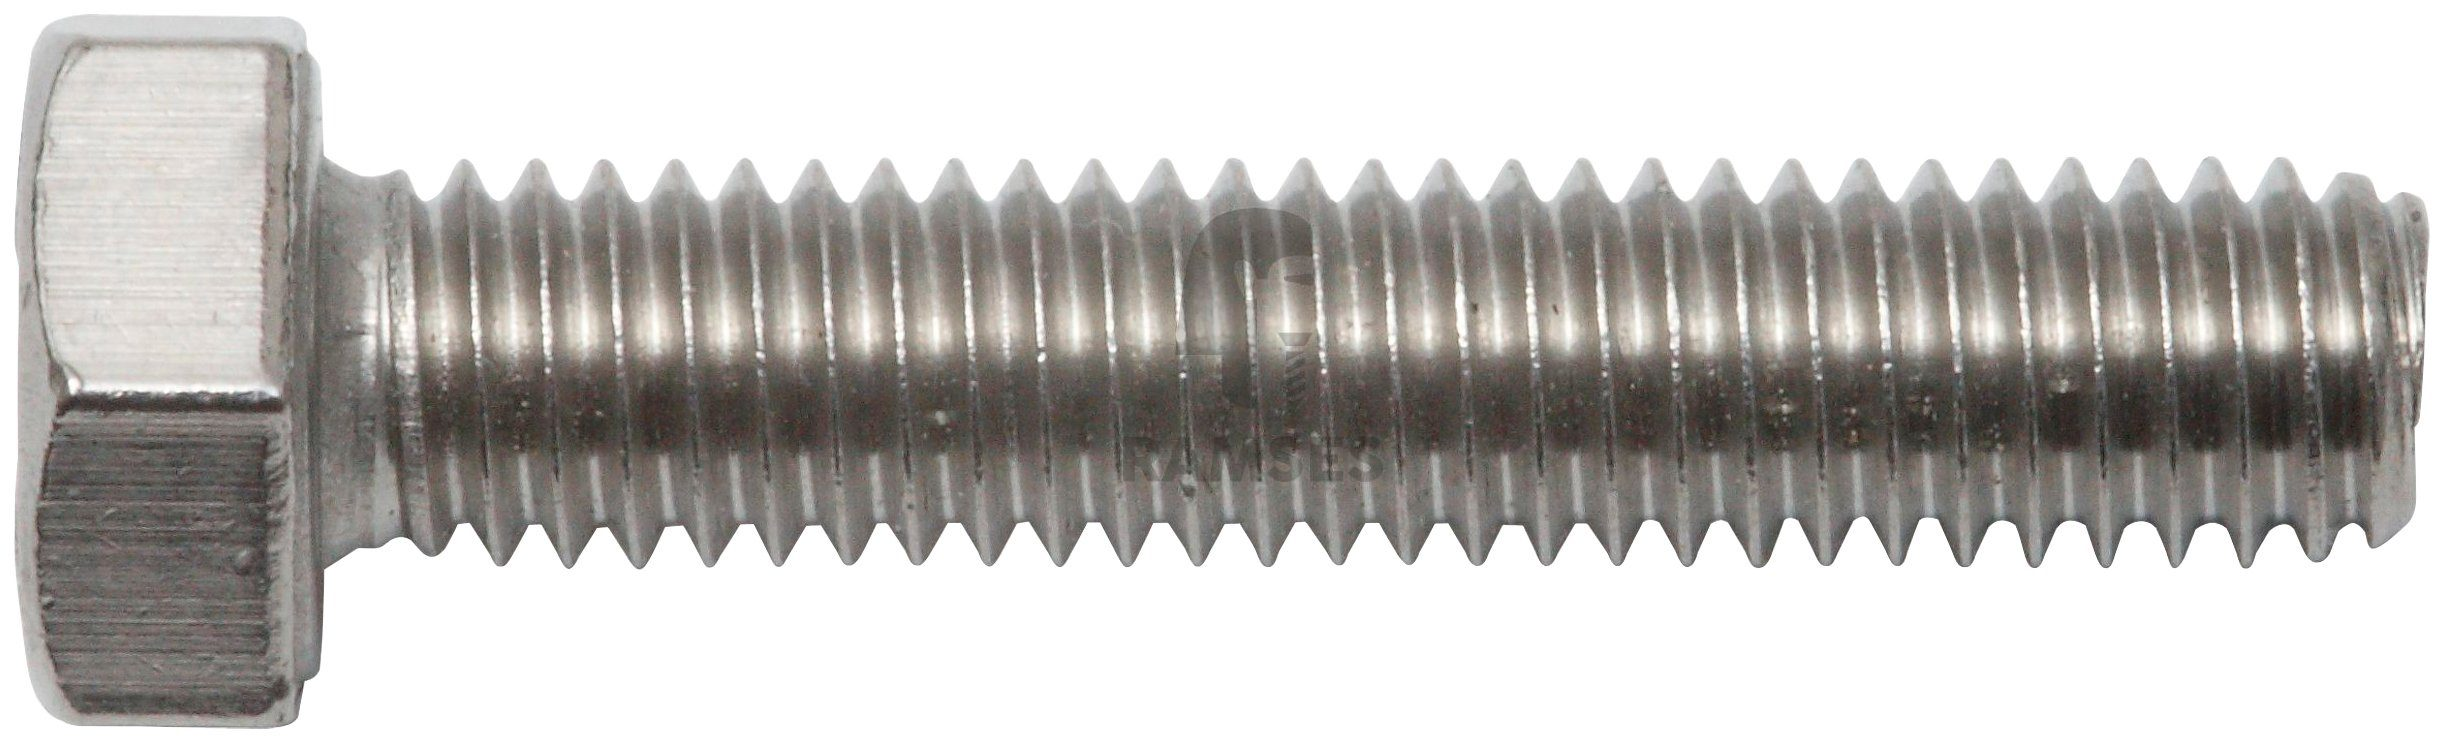 RAMSES Schrauben , Sechskantschraube M12 x 40 mm 20 Stk.